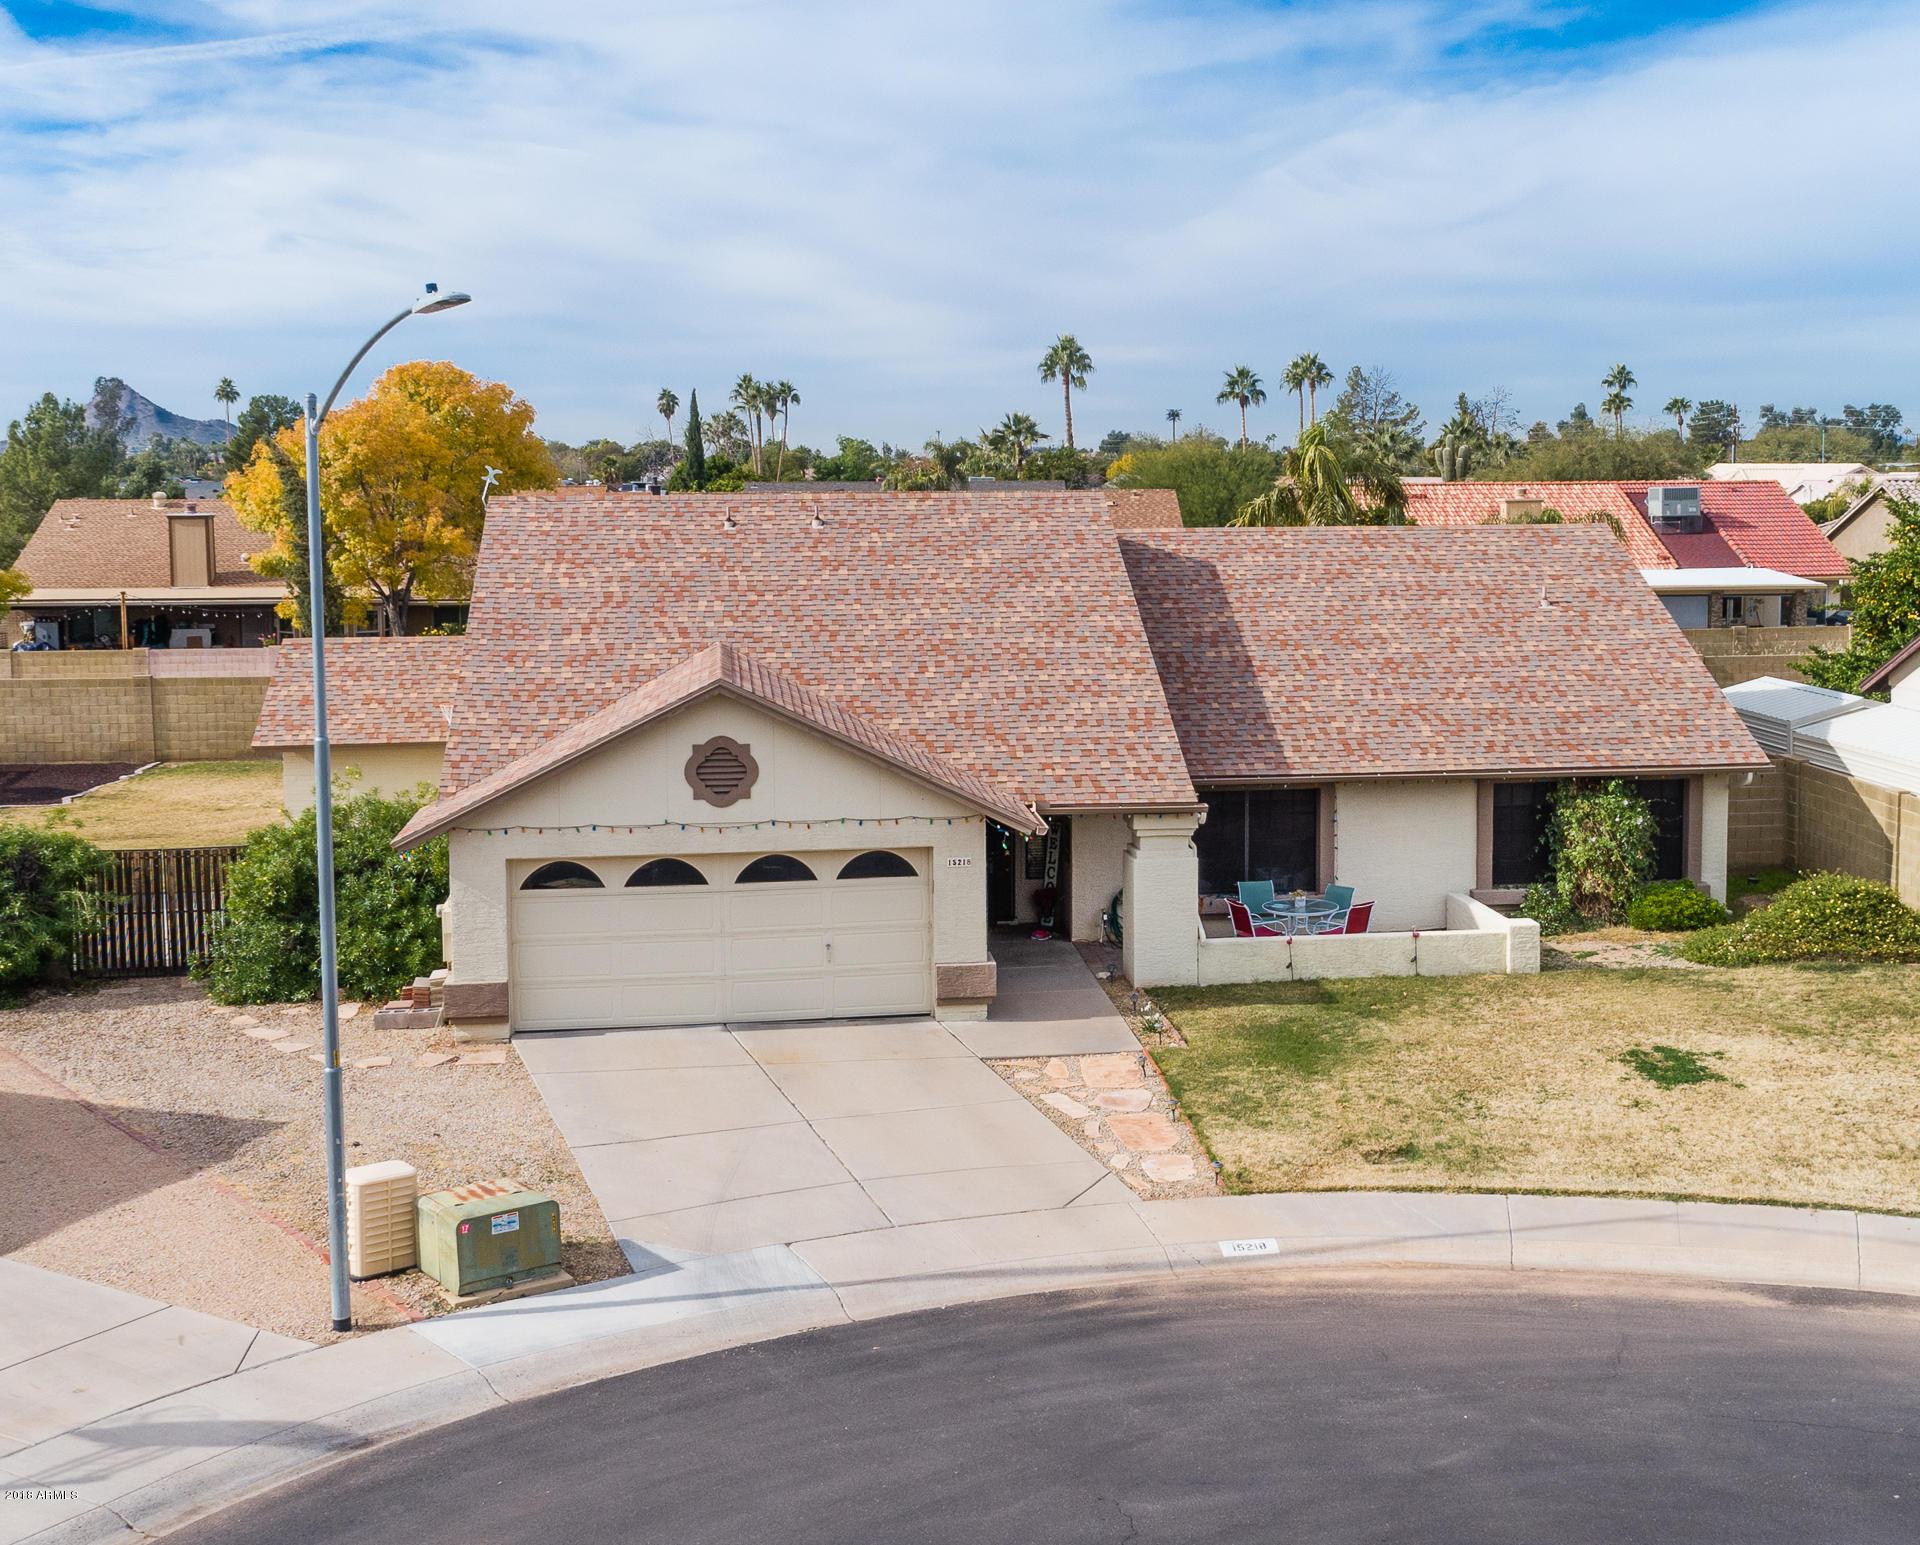 15218 N 43RD Street Phoenix, AZ 85032 - MLS #: 5858022